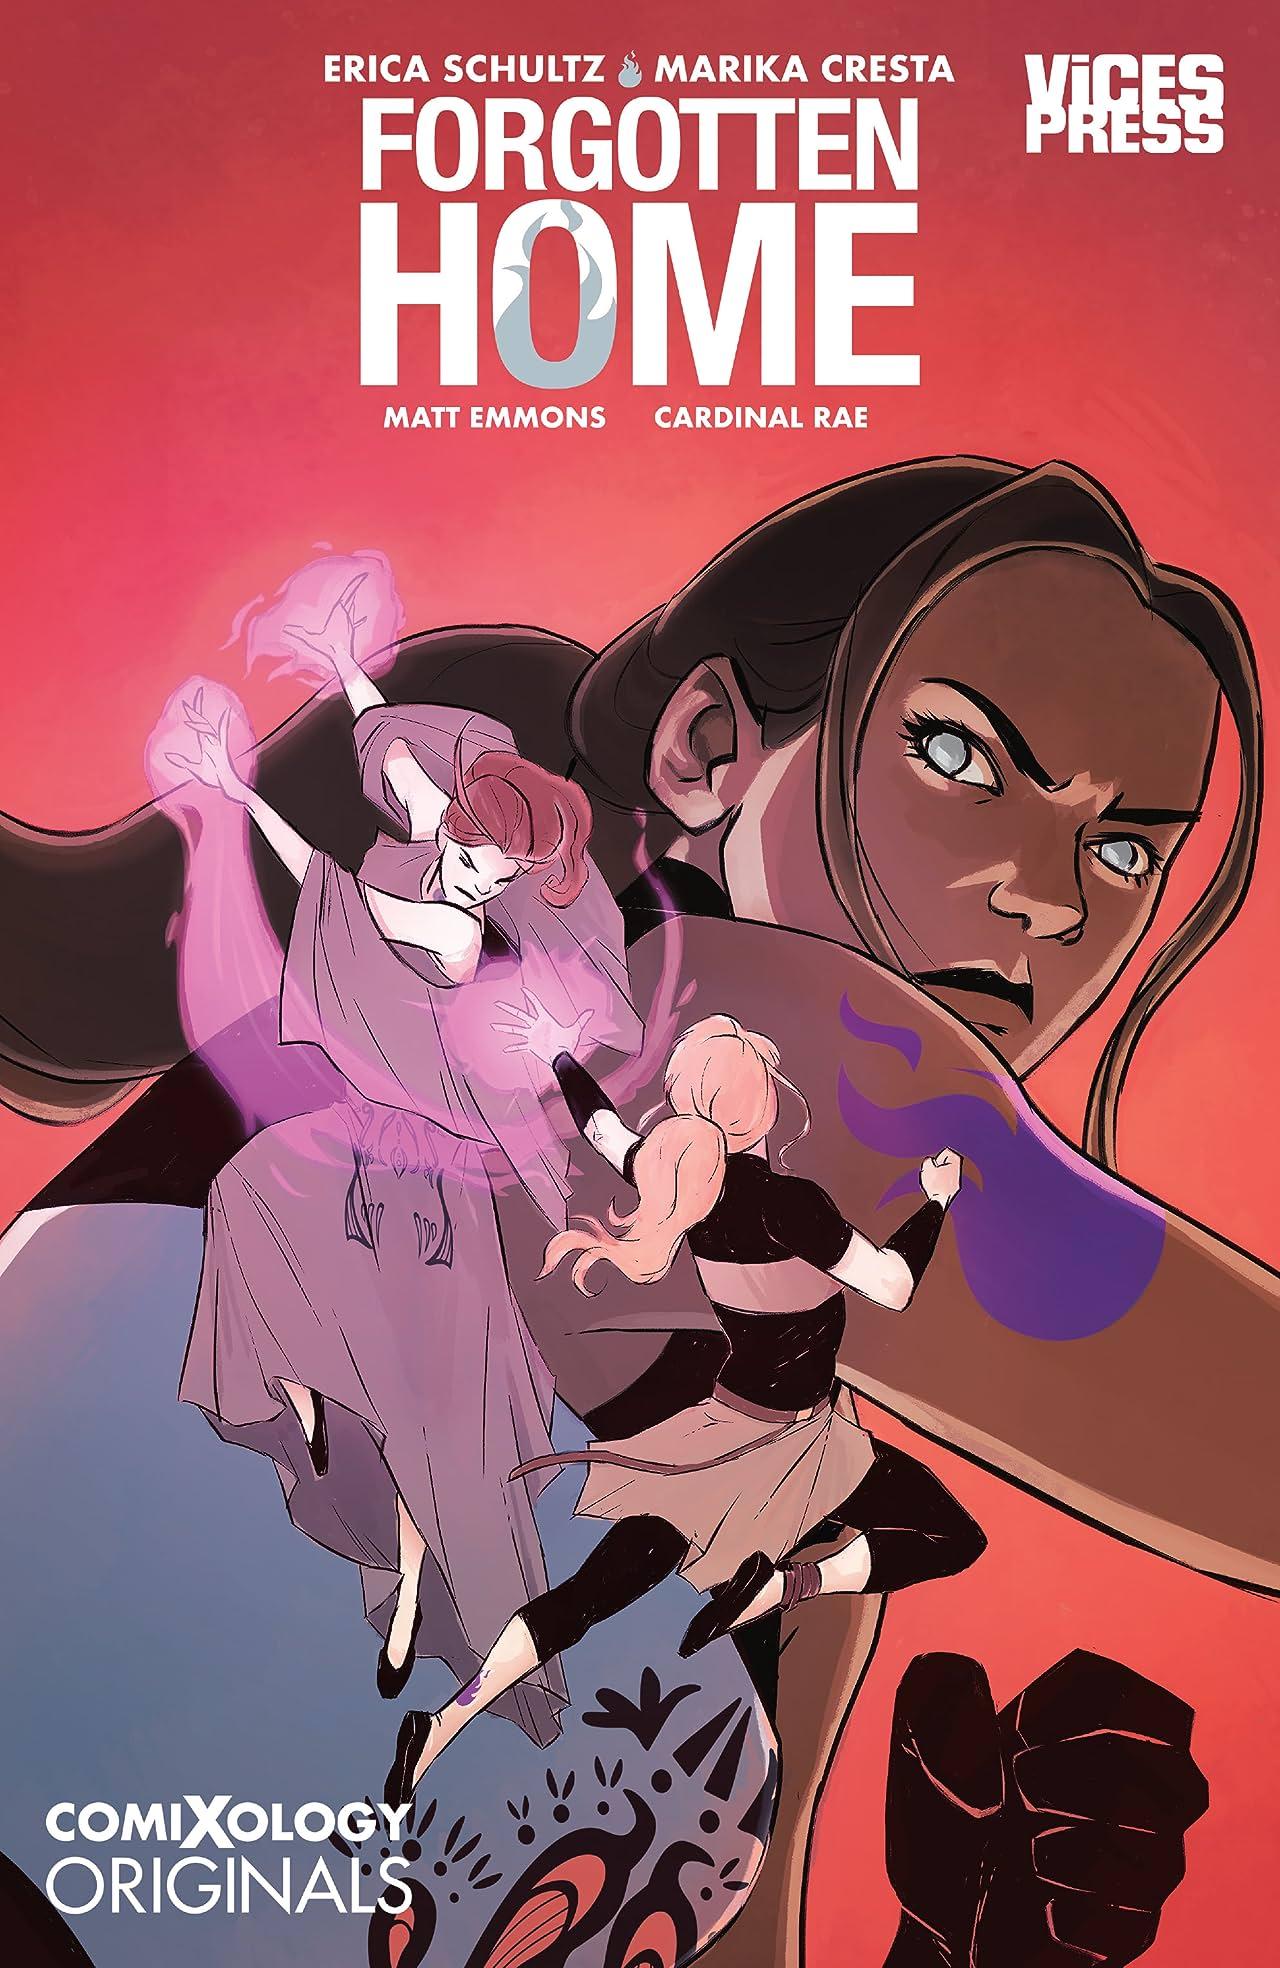 Forgotten Home (comiXology Originals) #7 (of 8)